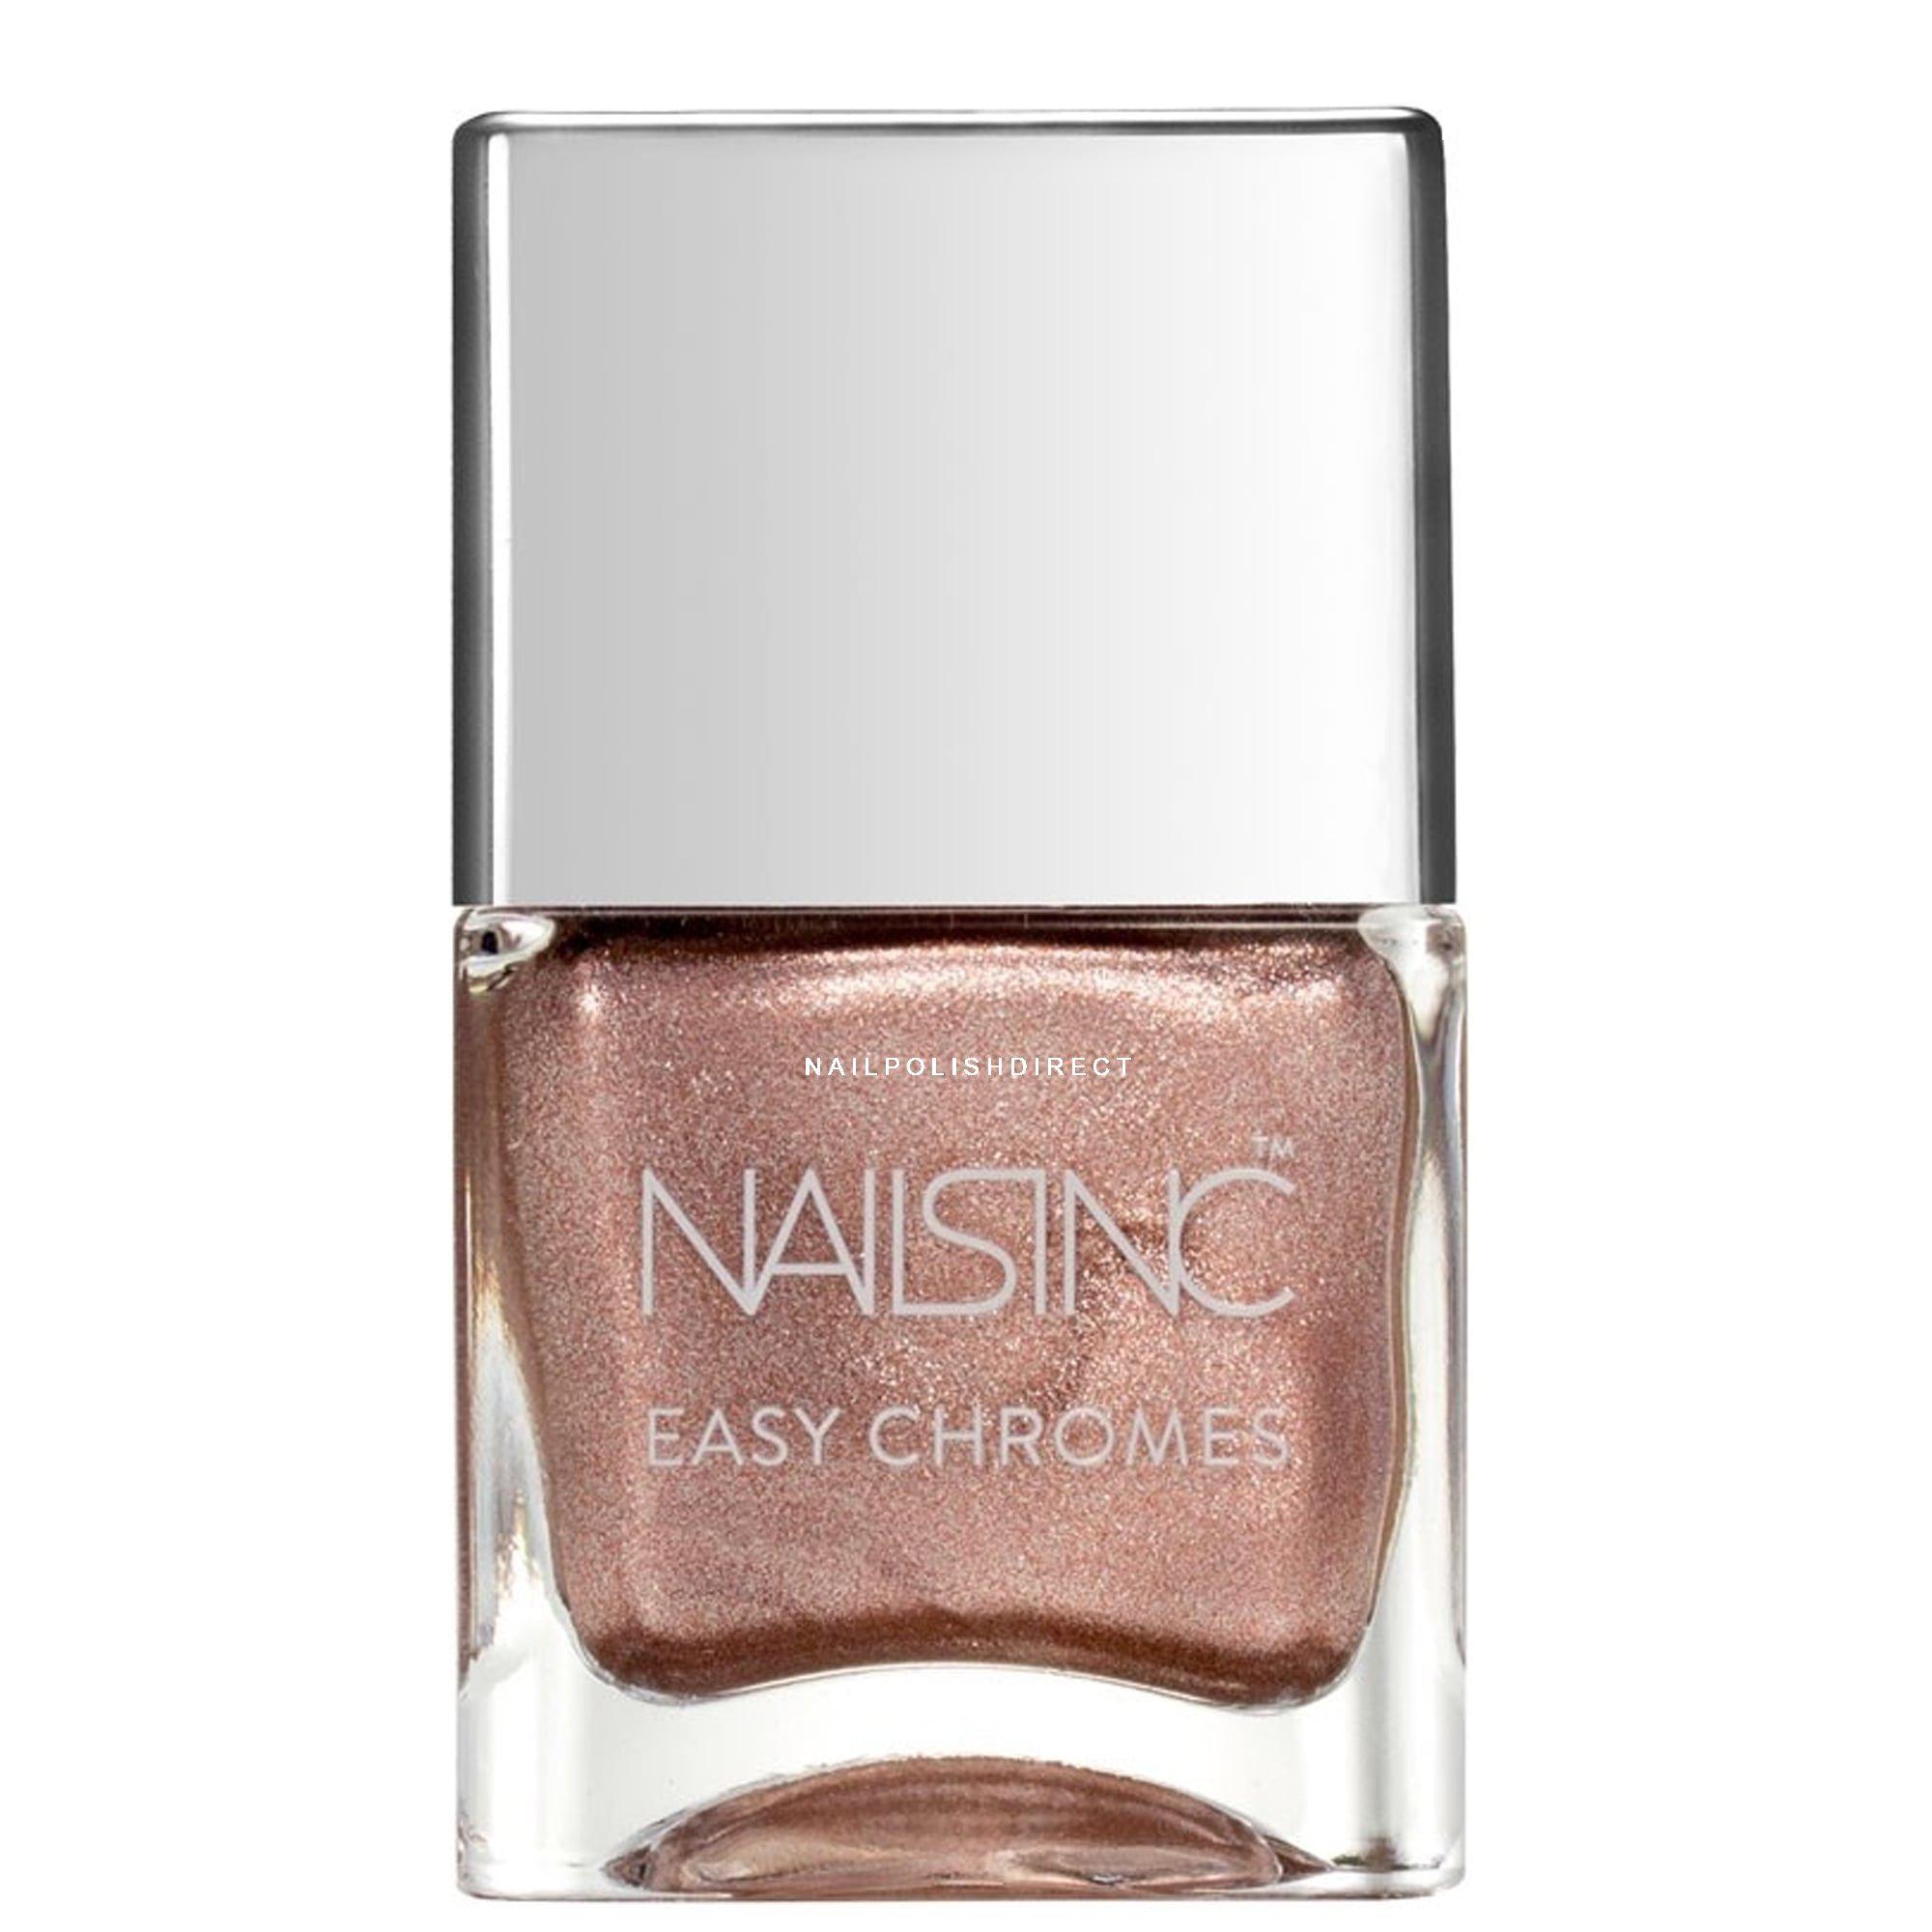 Nails Inc Easy Chromes Nail Polish